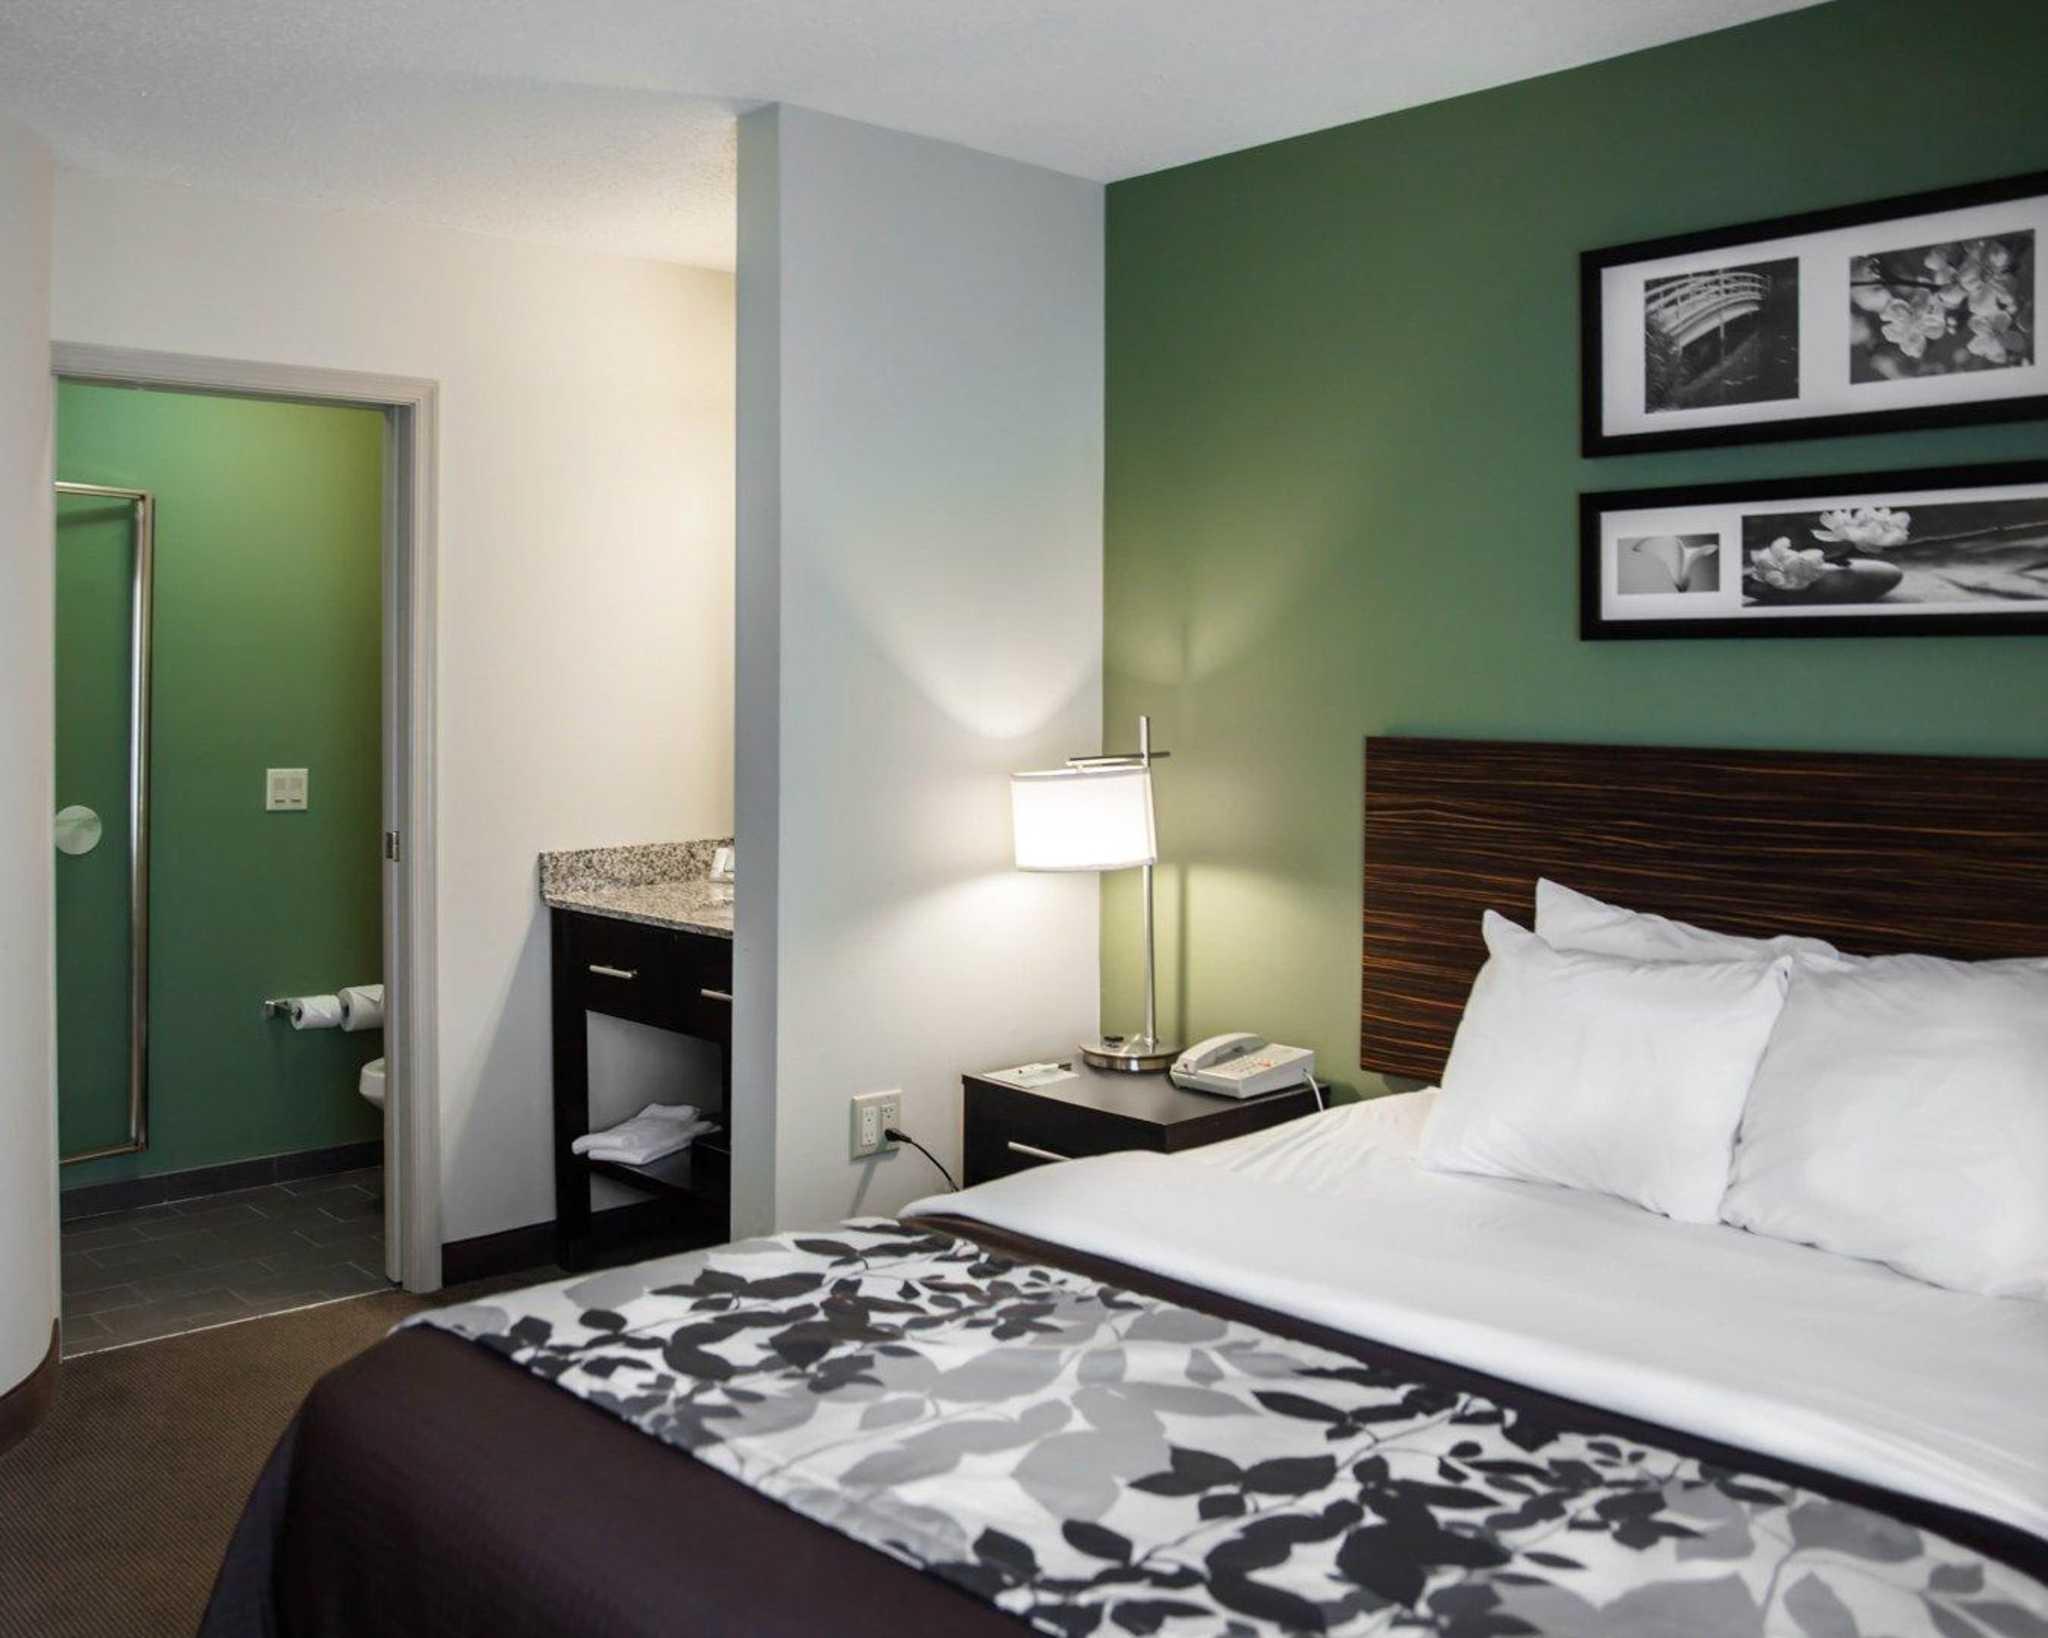 Sleep Inn  U0026 Suites Edgewood Near Aberdeen Proving Grounds